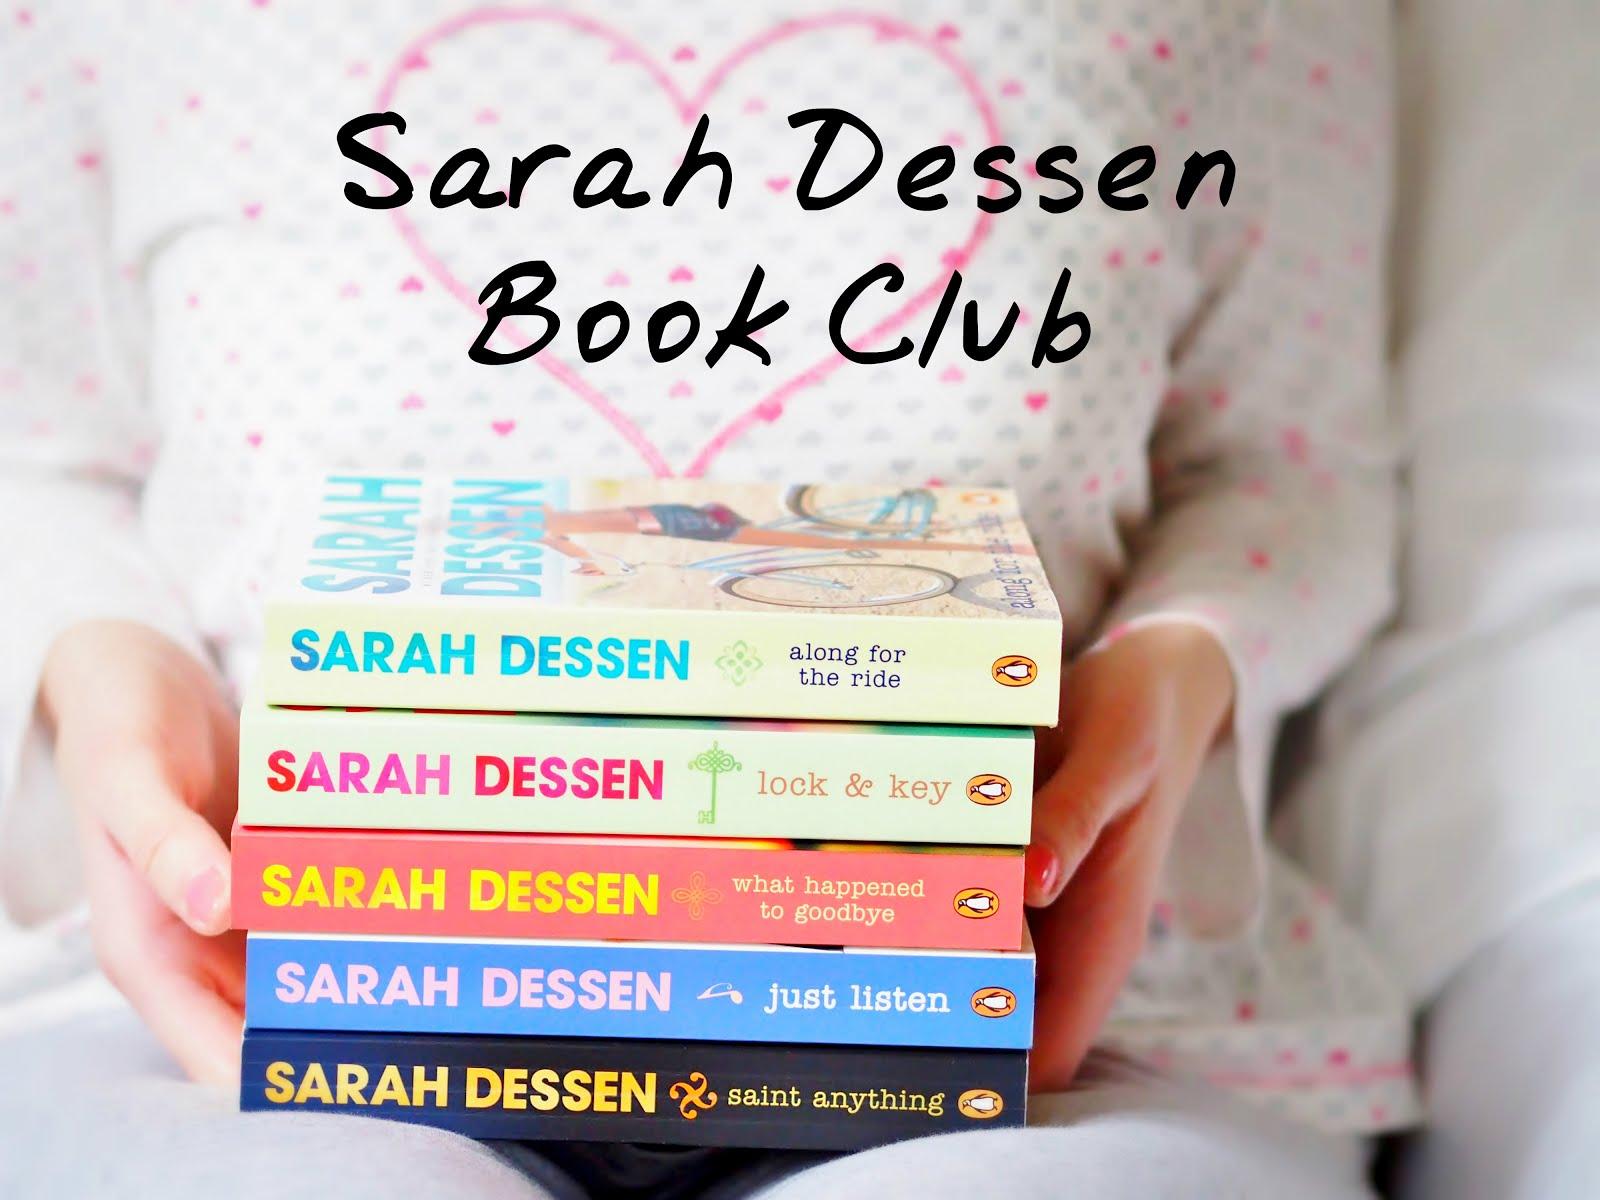 Sarah Dessen Book Club